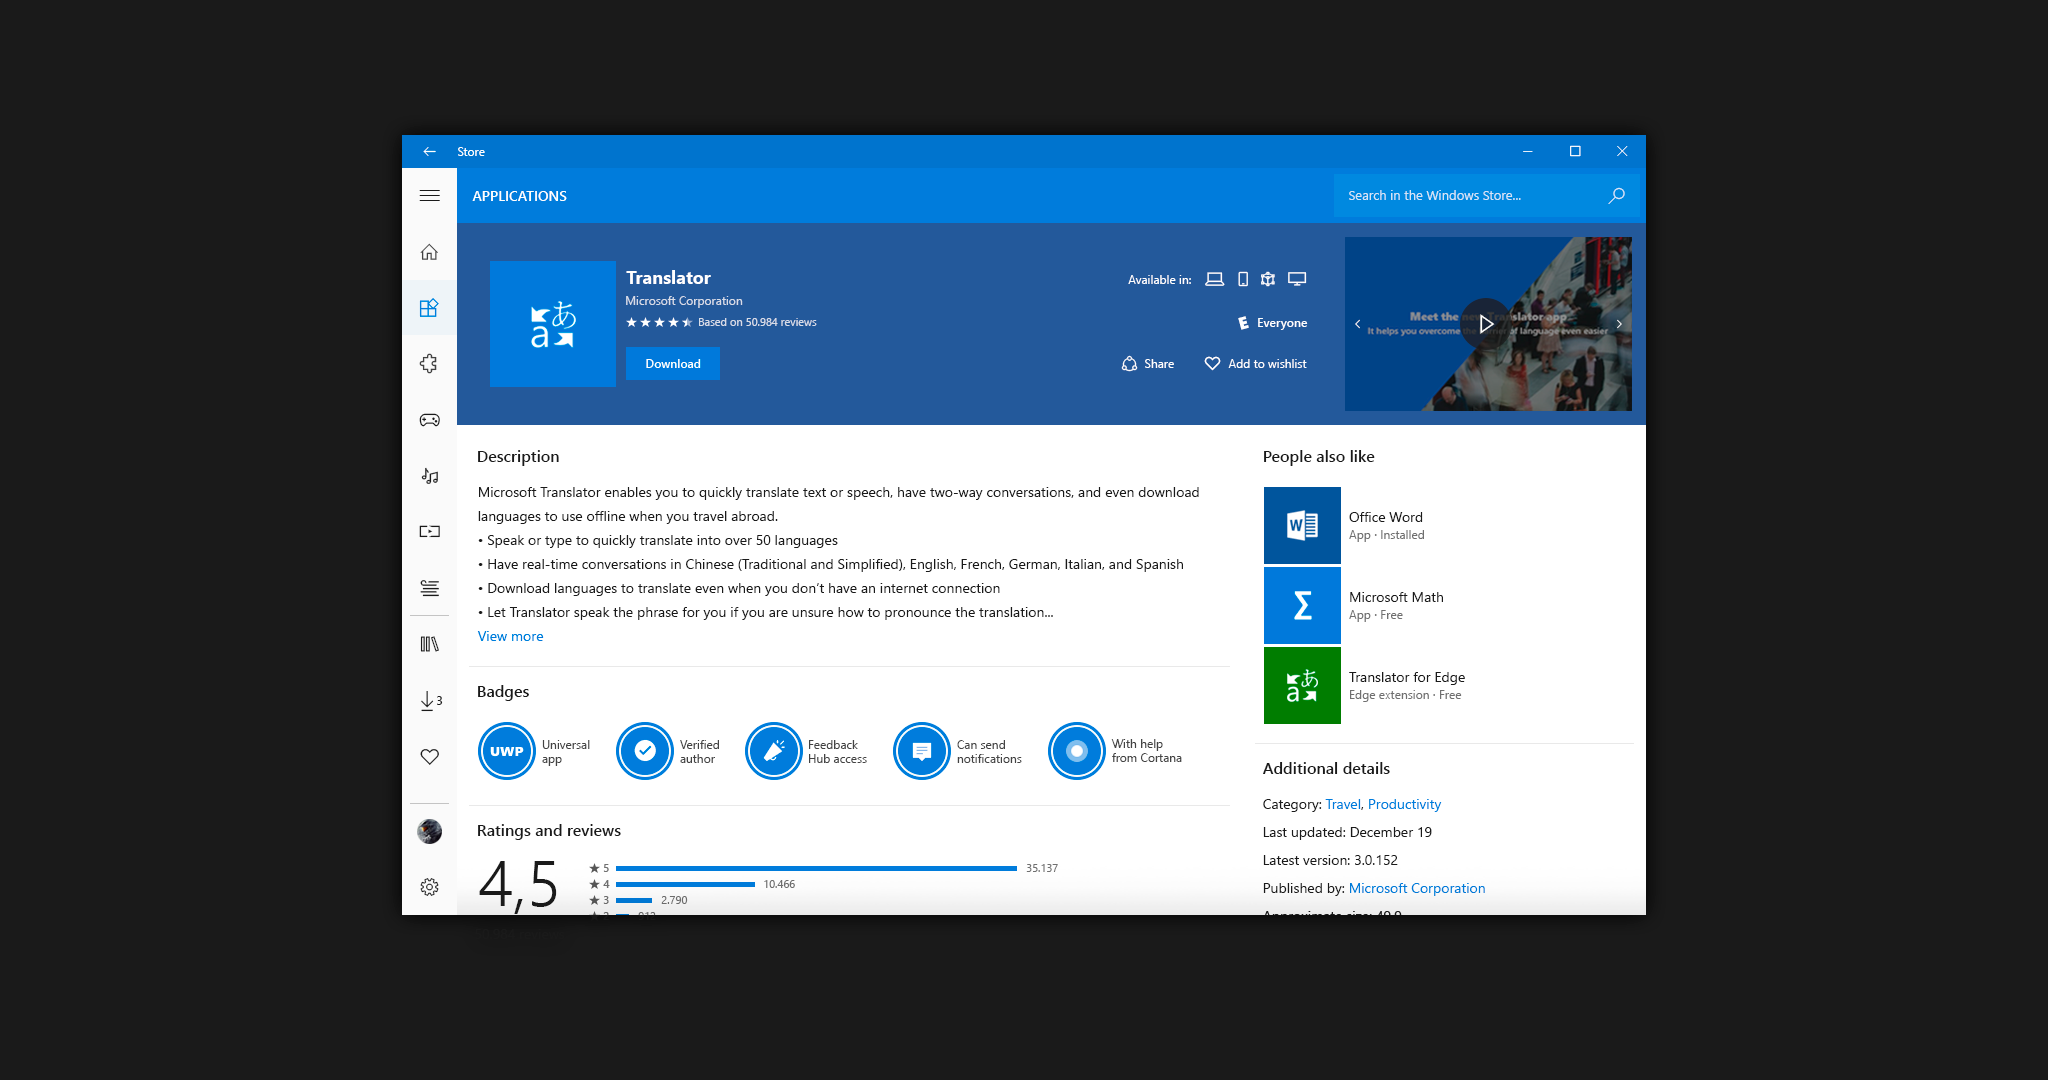 Windows 10 NEON: Store